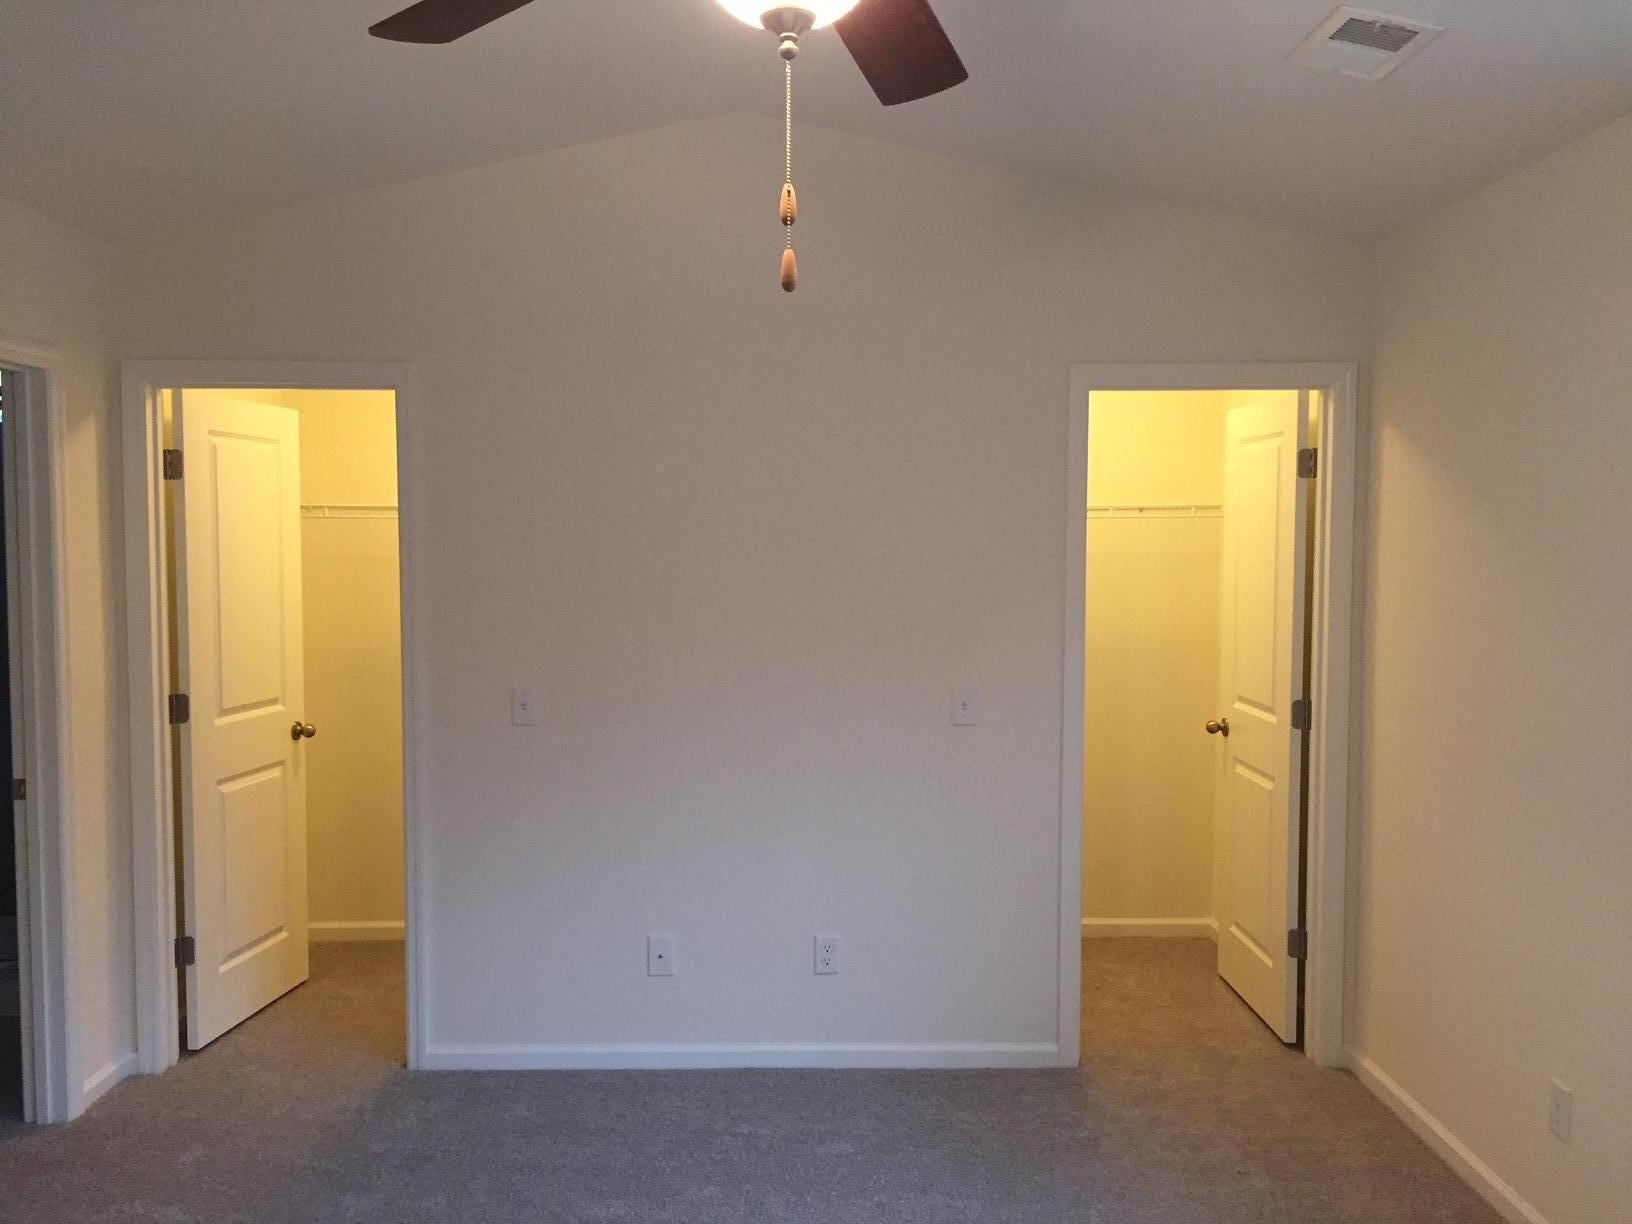 Riverland Place Homes For Sale - 274 Stefan, Charleston, SC - 15